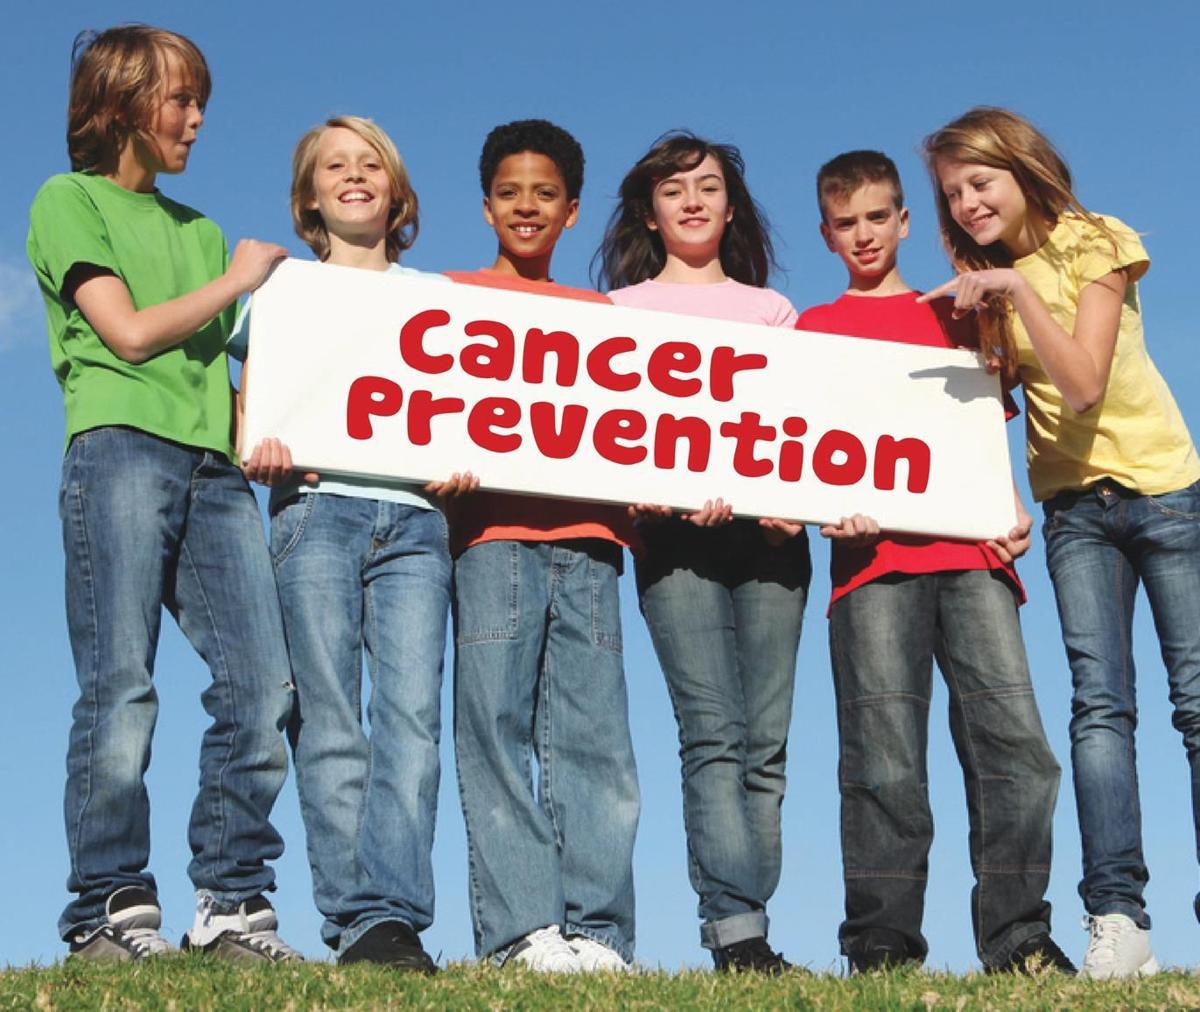 cancer prevention - kids